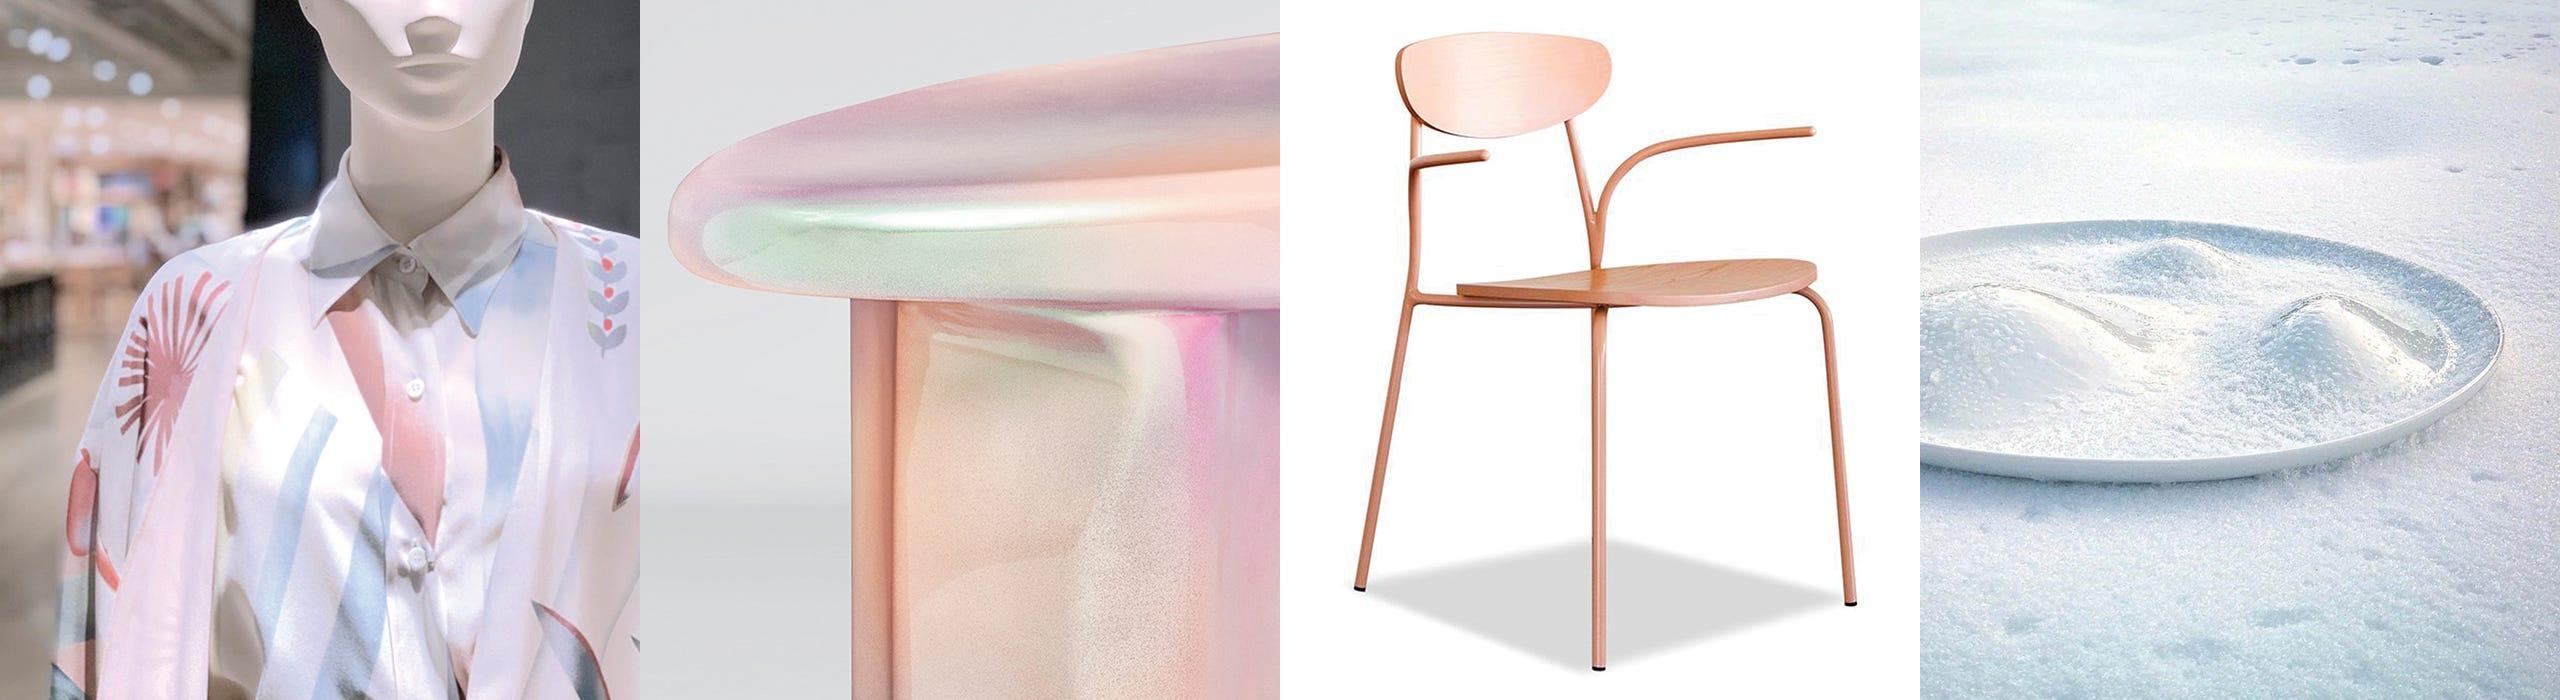 pantone-color-trend-clarify-main-image 1